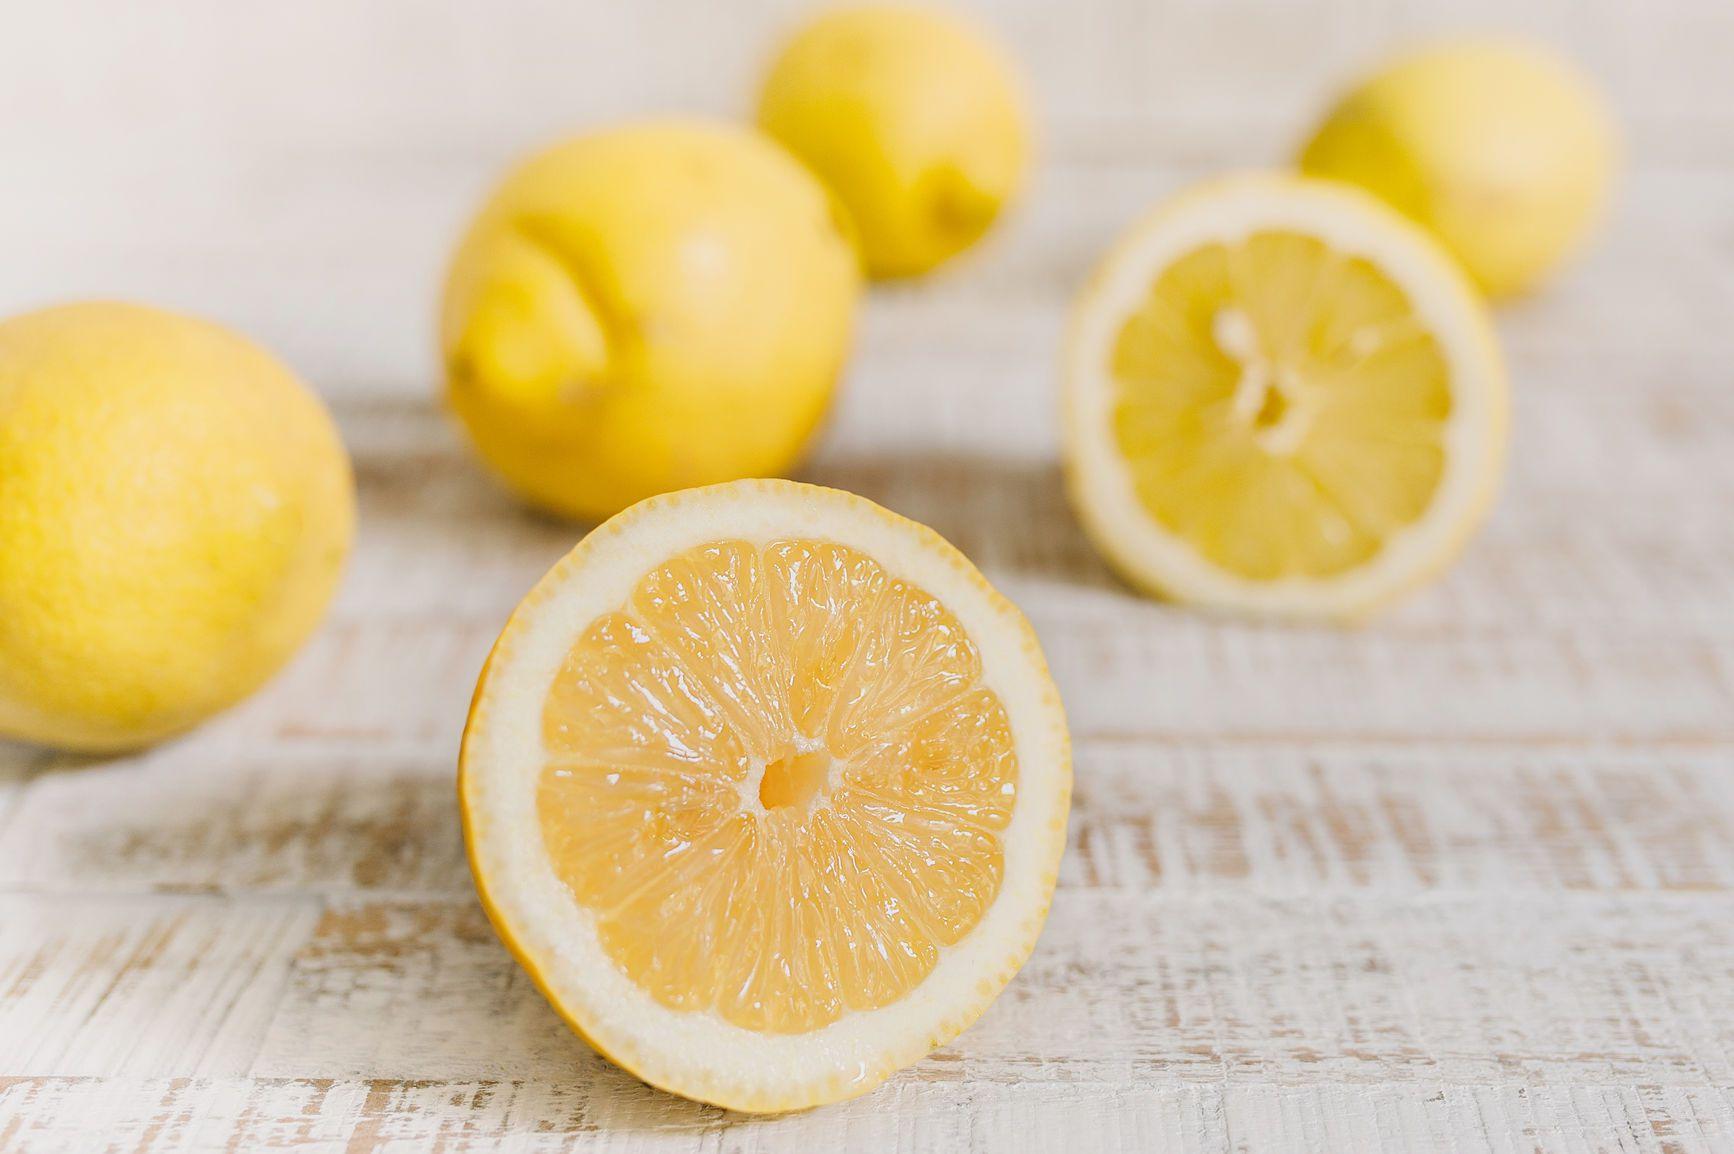 16 Surprising Uses for Lemon Juice